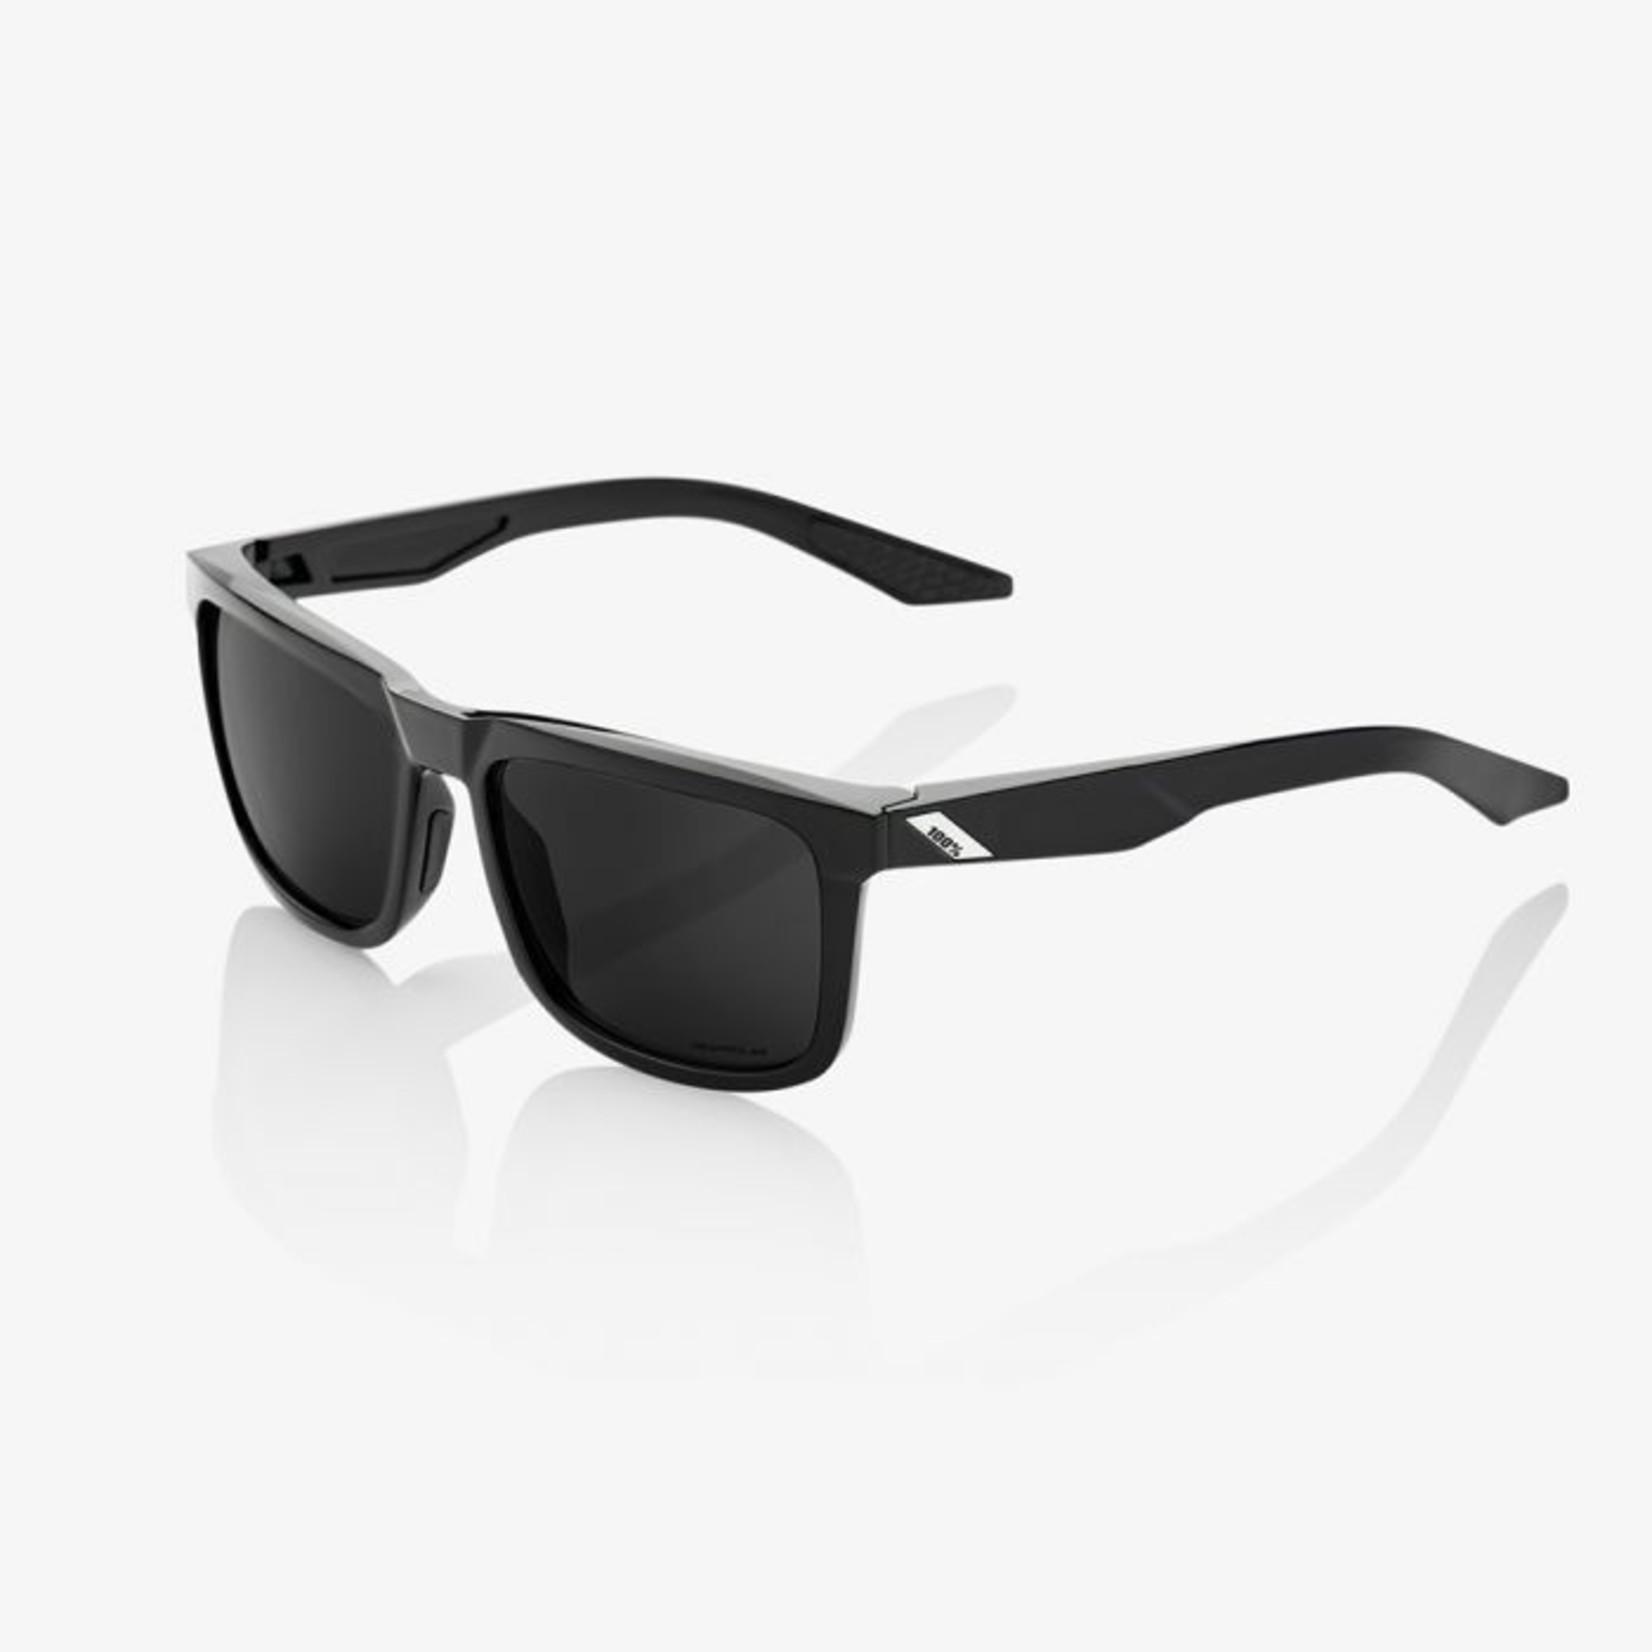 100% 100% Blake Sunglasses